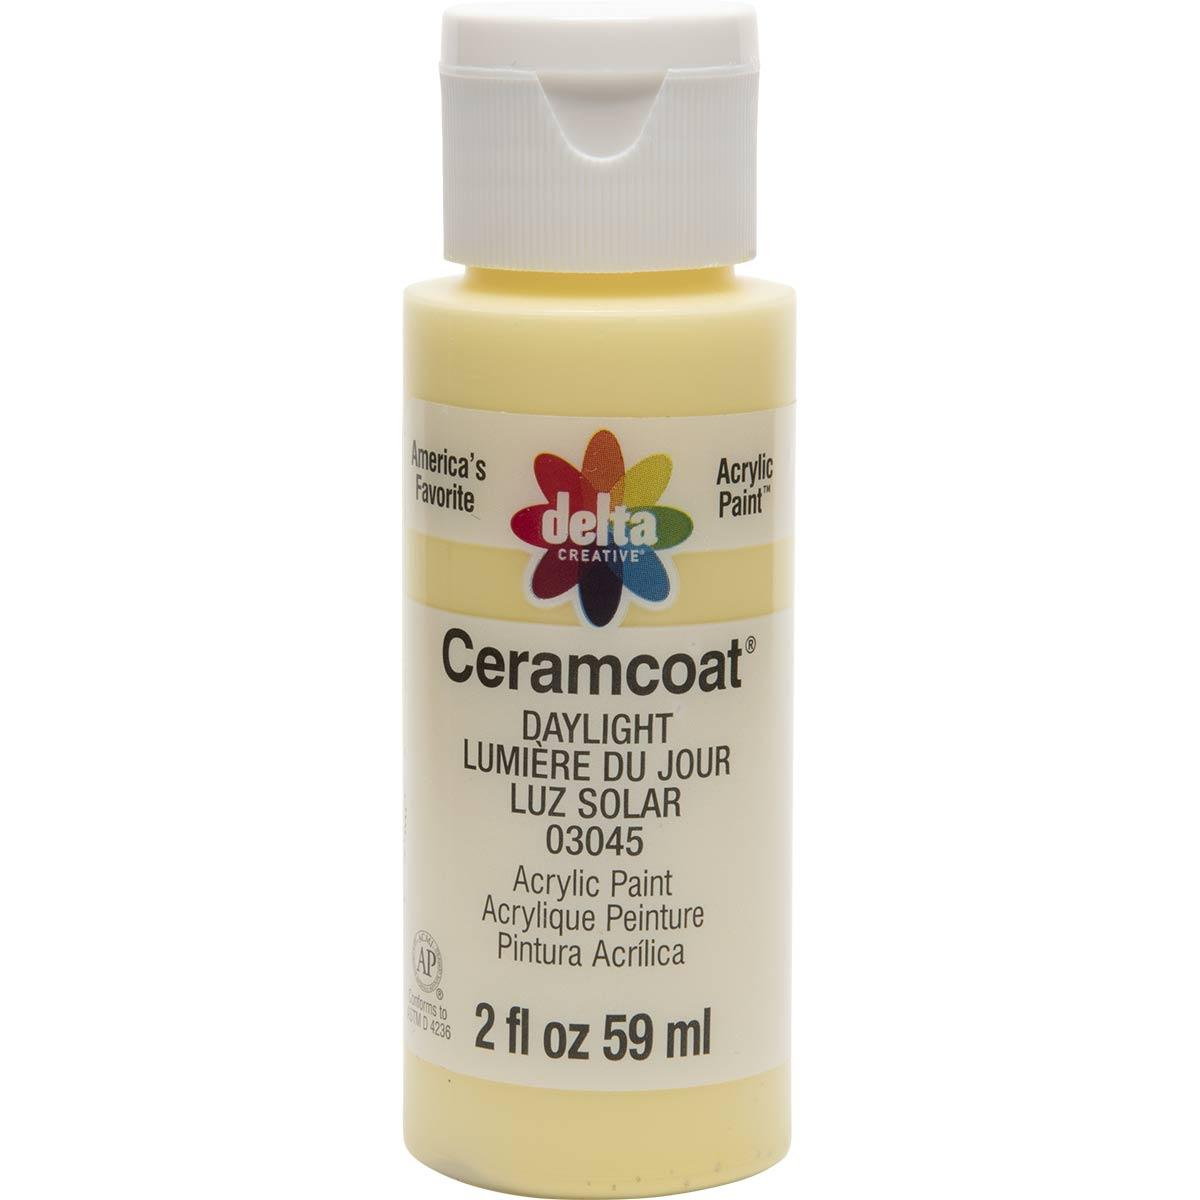 Delta Ceramcoat ® Acrylic Paint - Daylight, 2 oz. - 03045